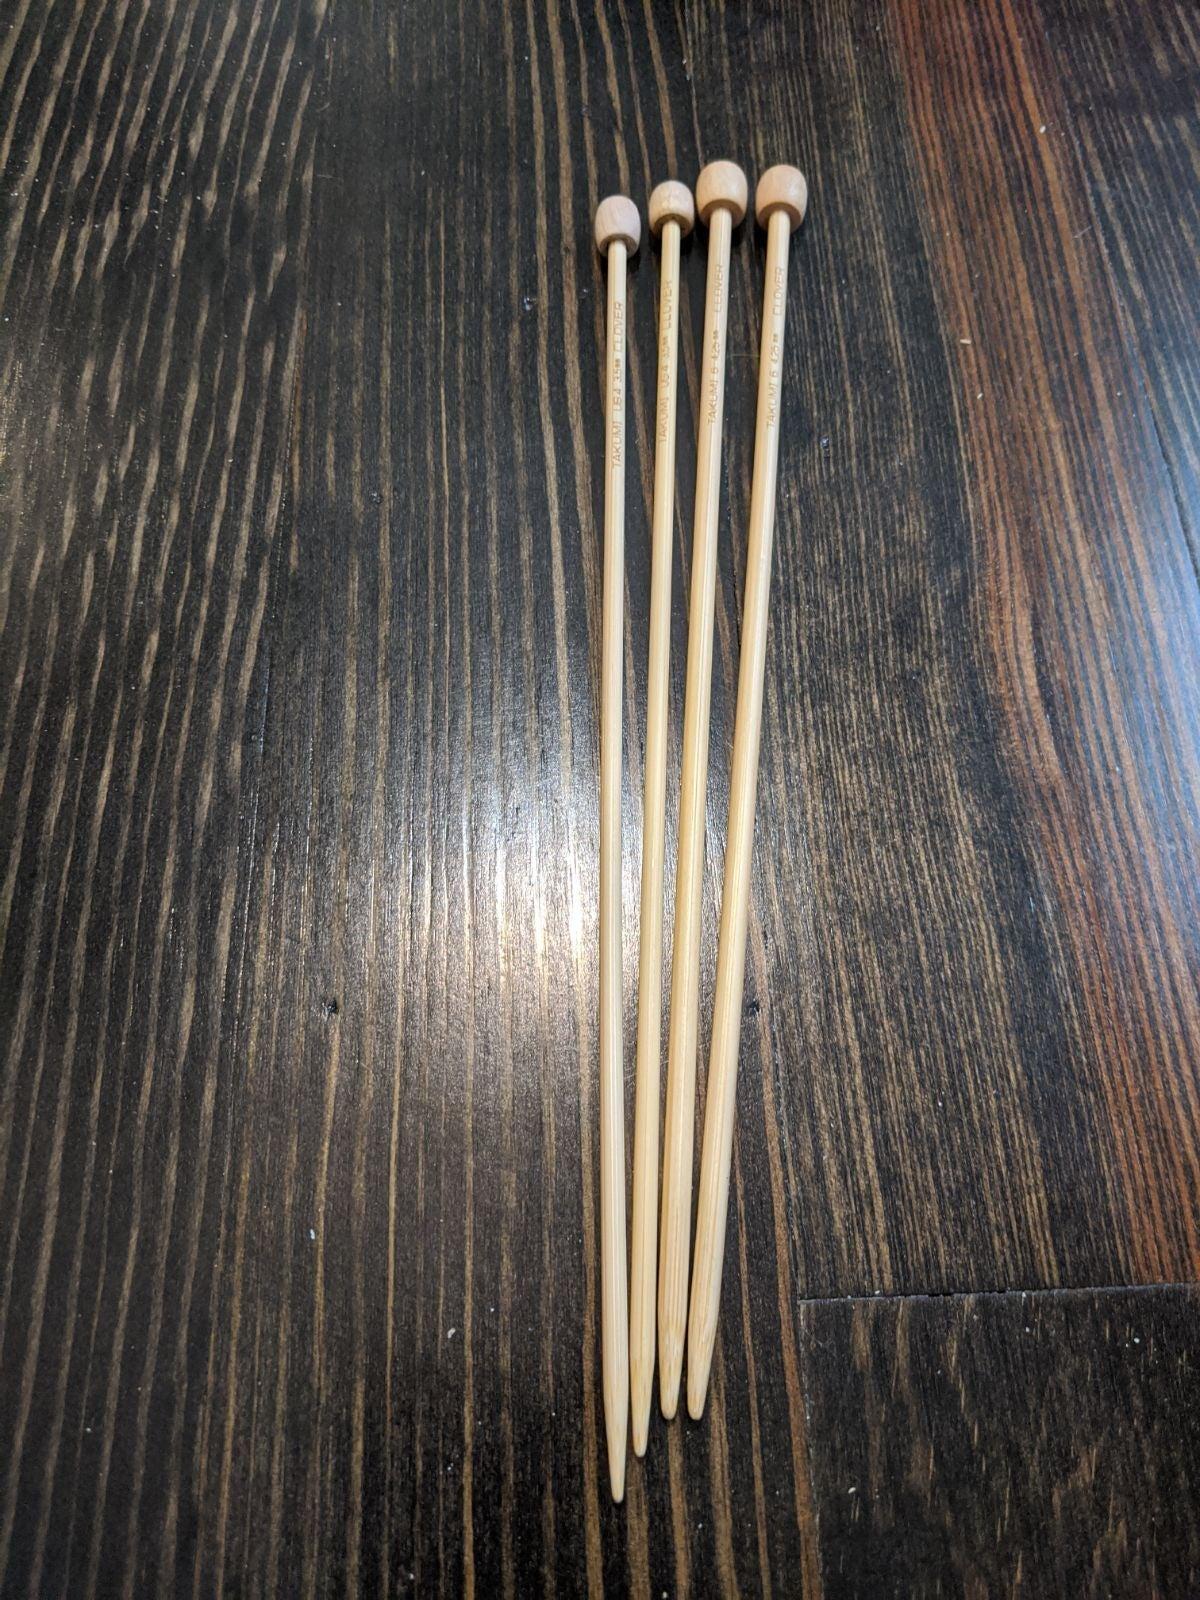 Sizes 6/4 clover takumi knitting needles